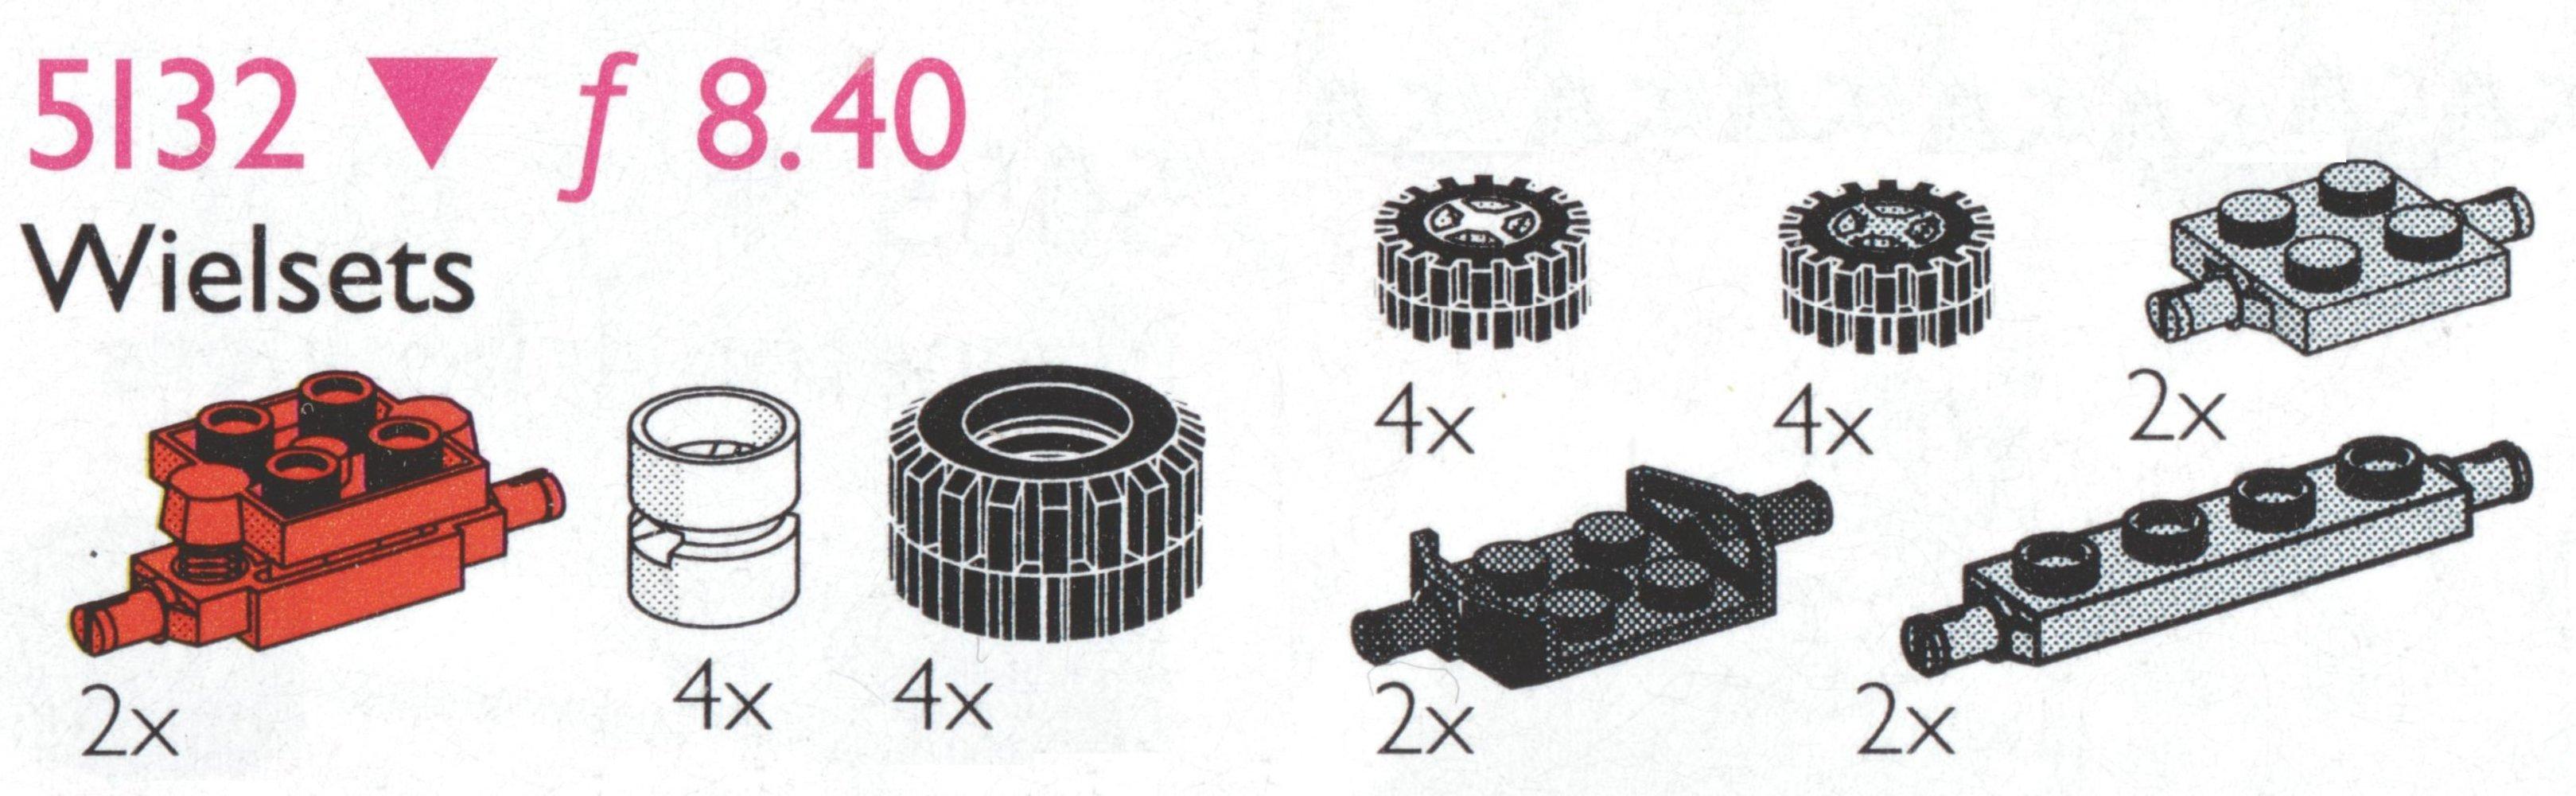 Wheels, Bearings and Suspension